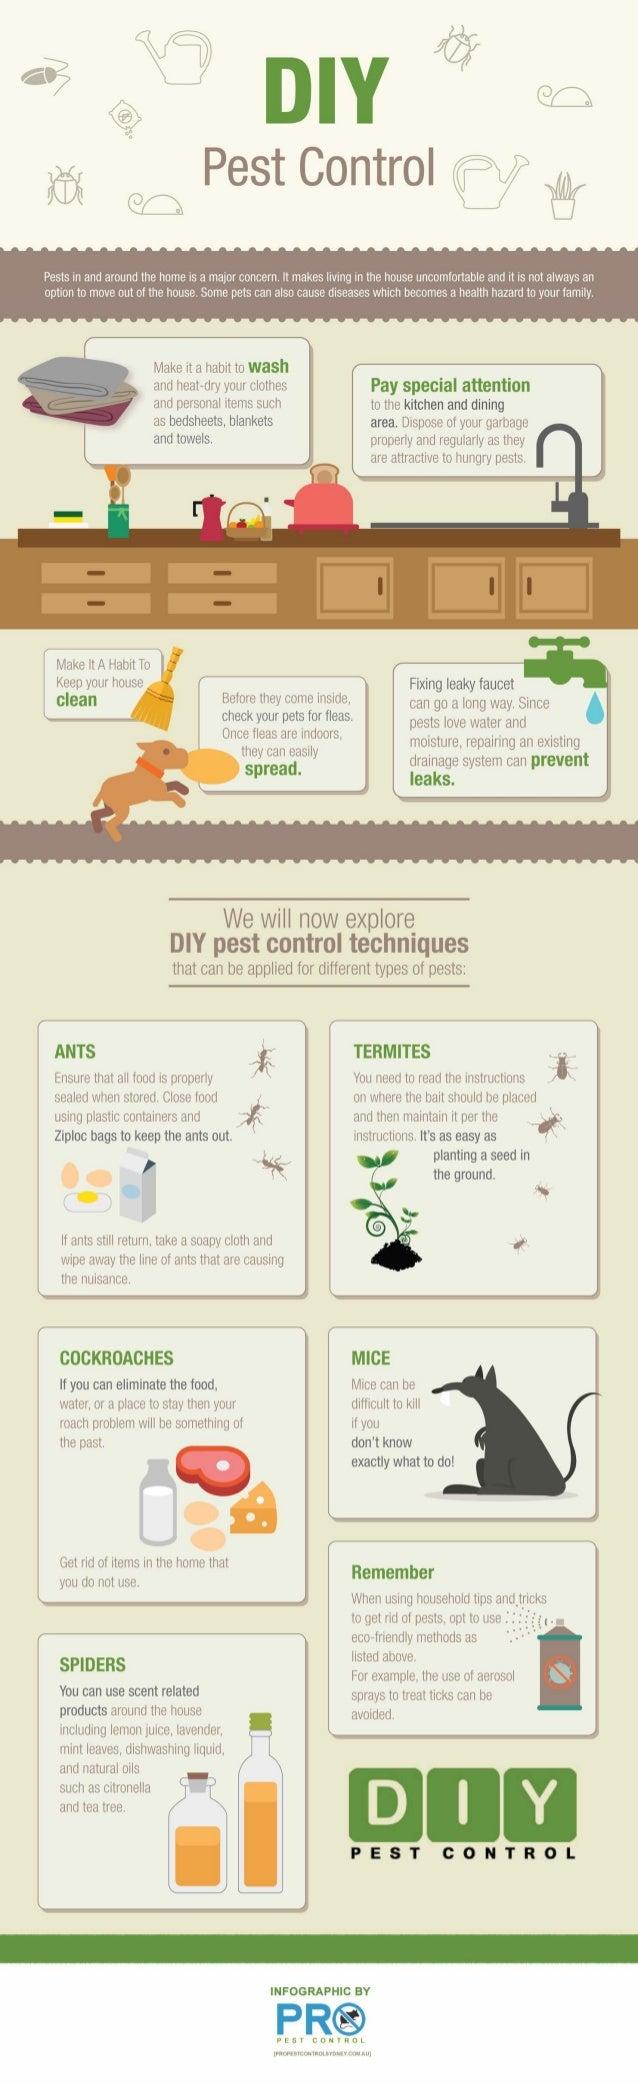 DIY Pest Control Infographic